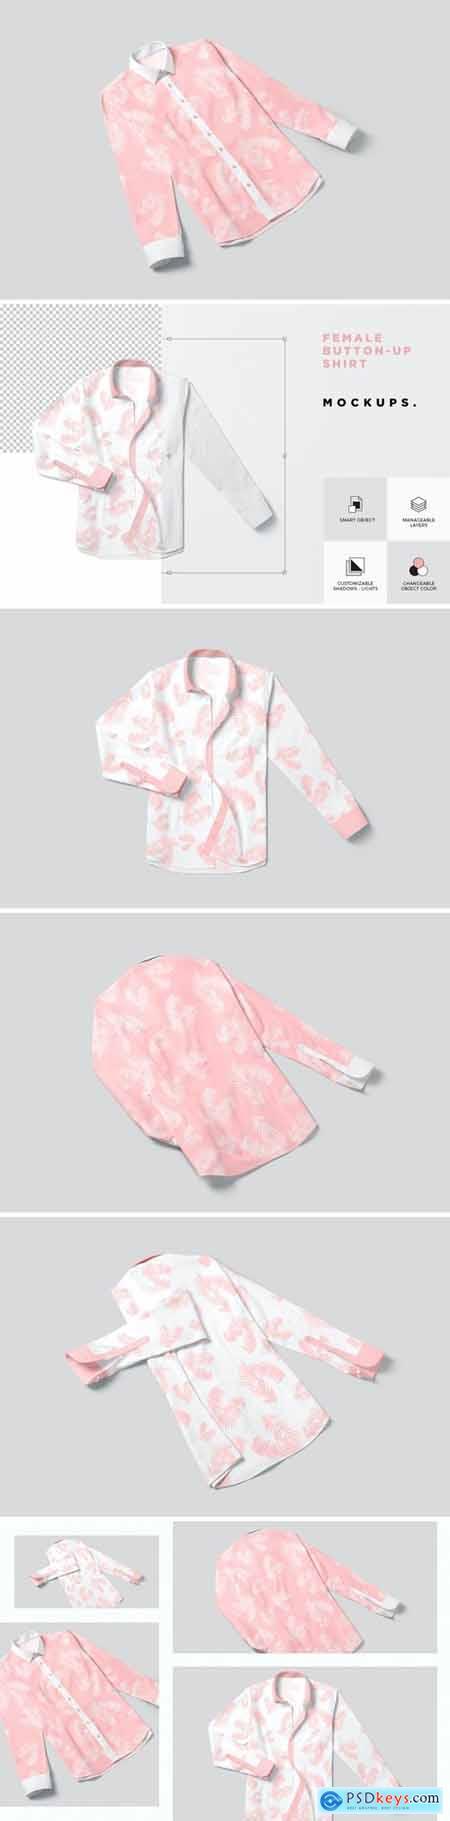 Button Up Shirt For Women Mockups